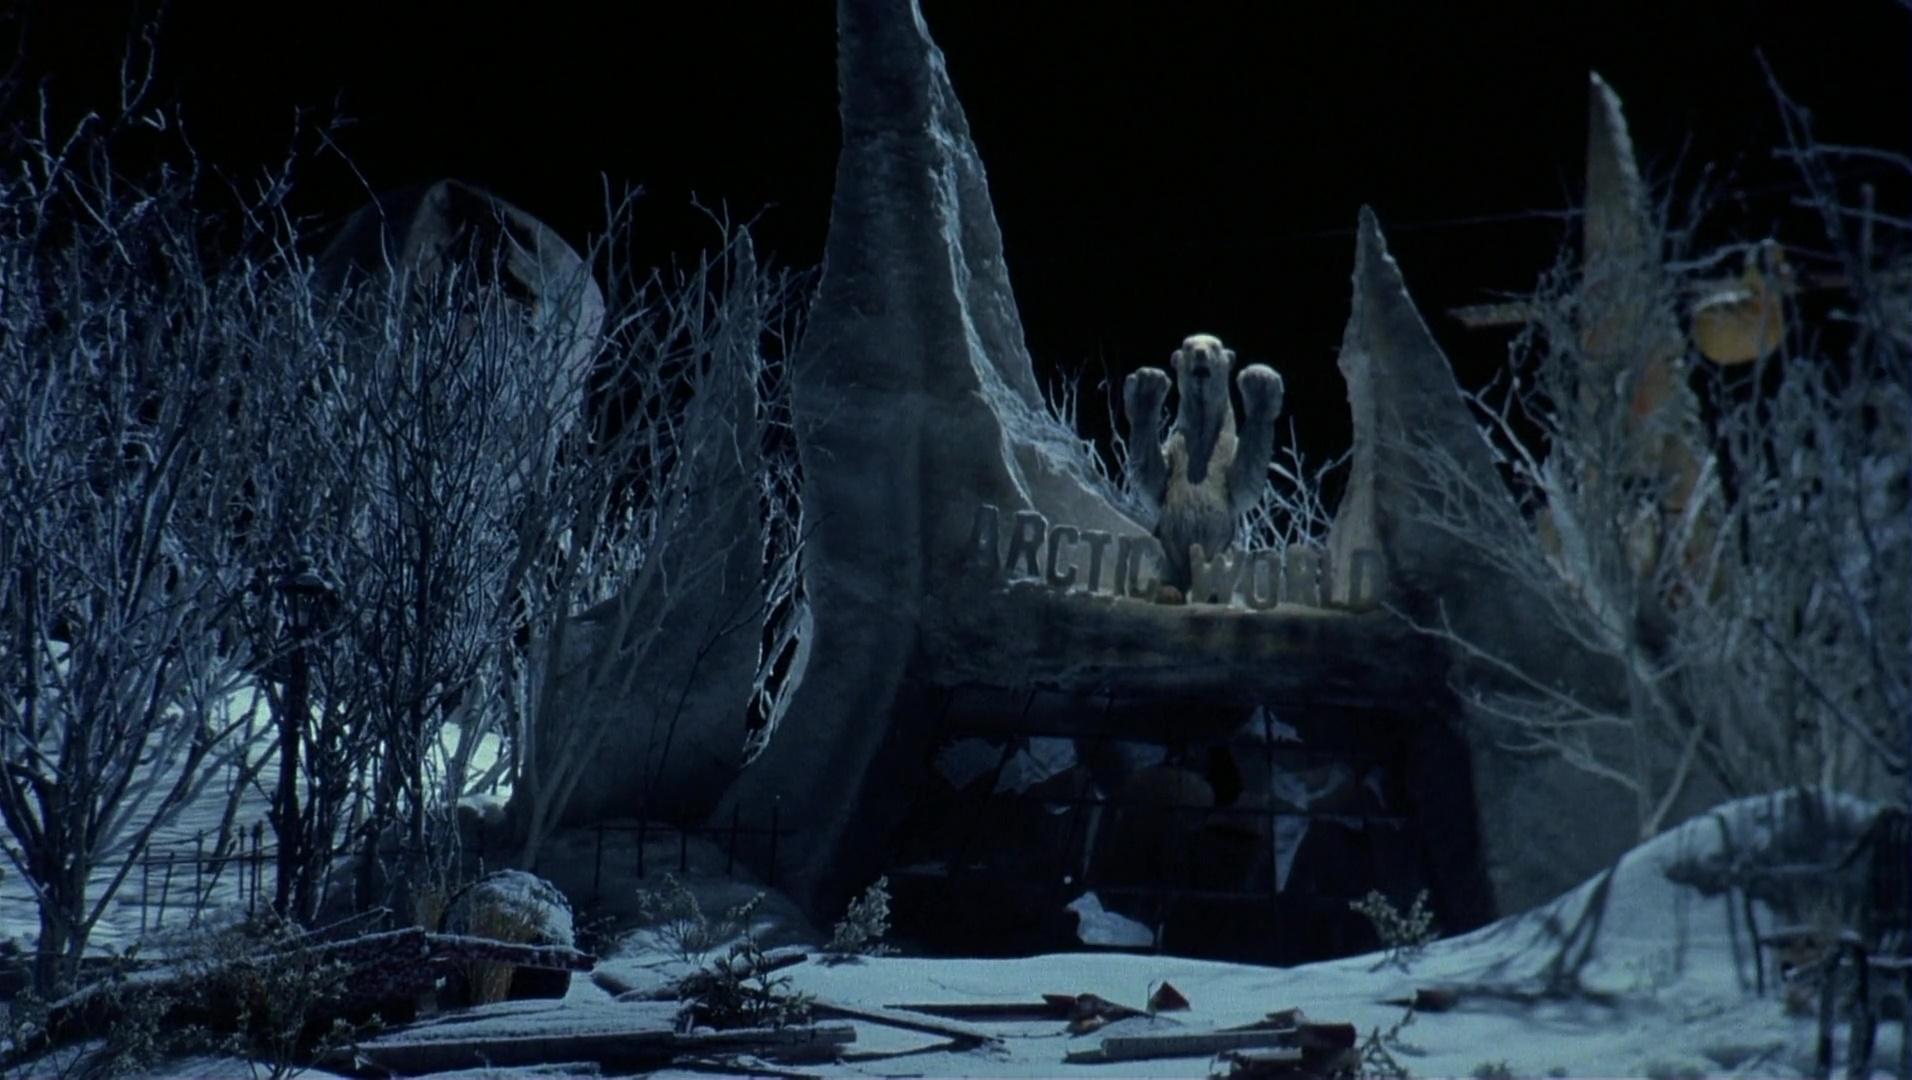 File:Batman Returns Artic World.jpg